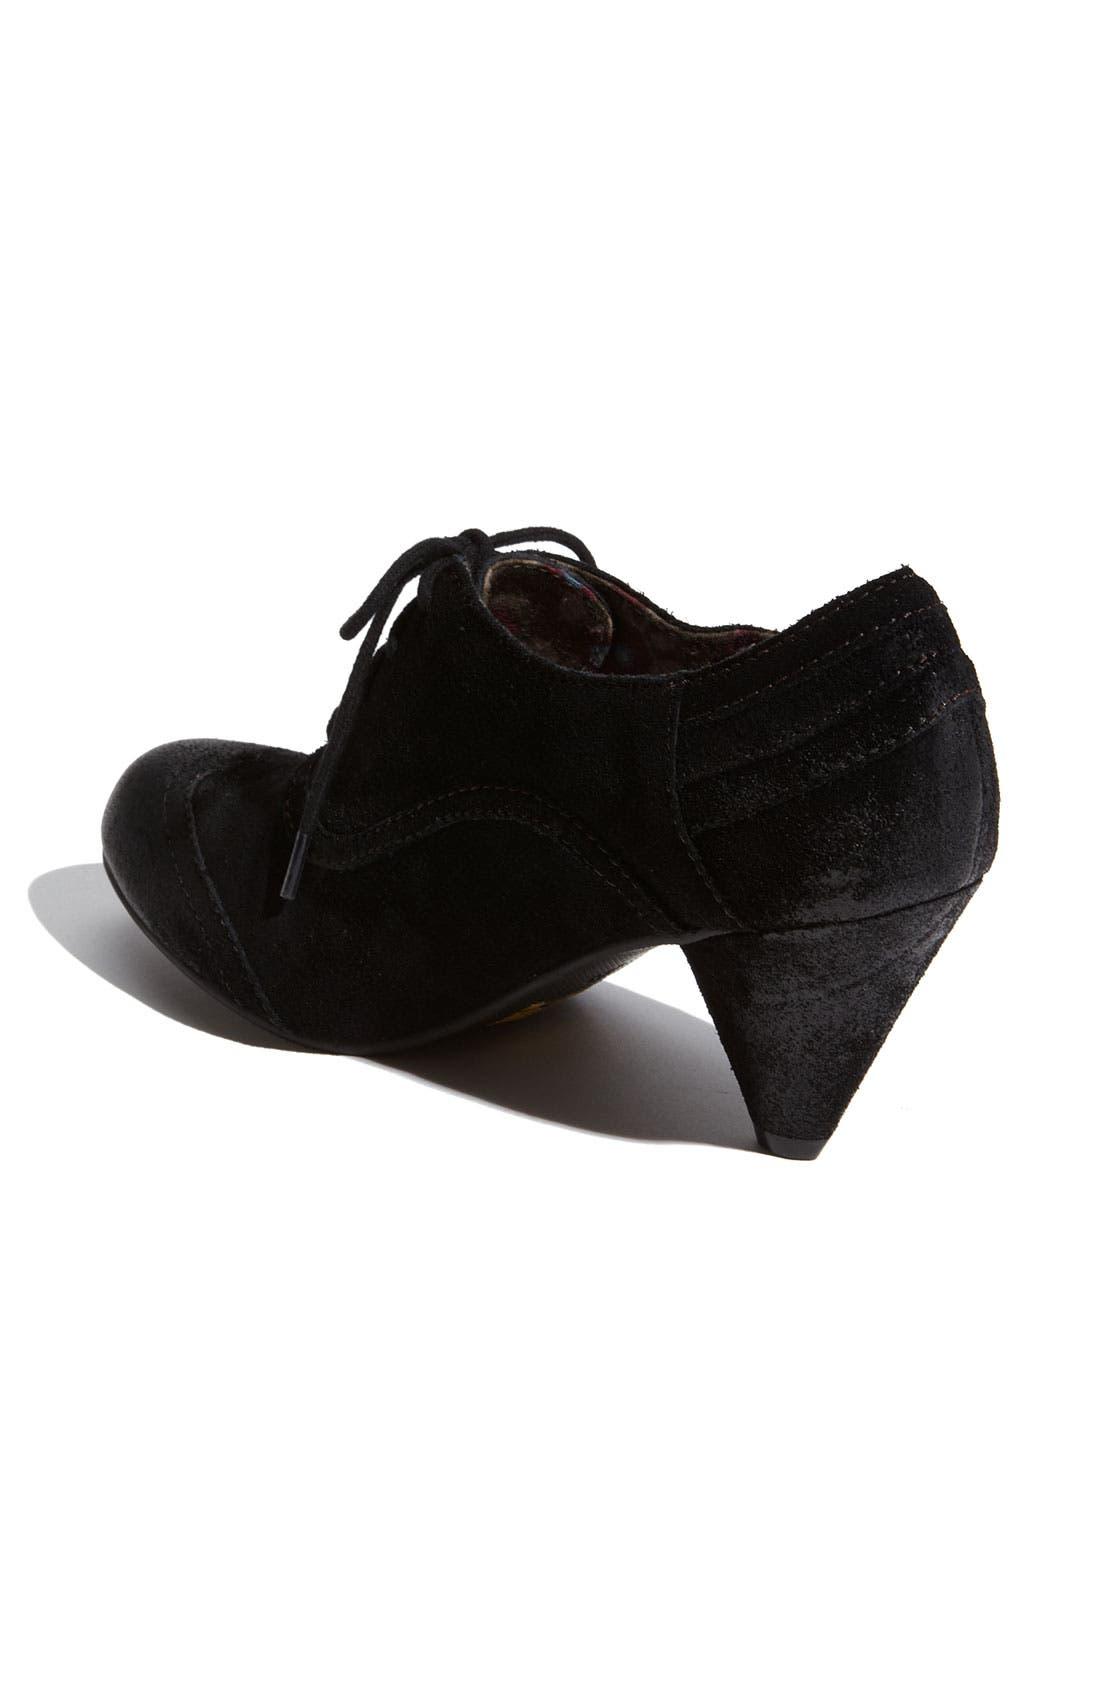 Alternate Image 2  - BC Footwear 'Foil' Oxford Pump